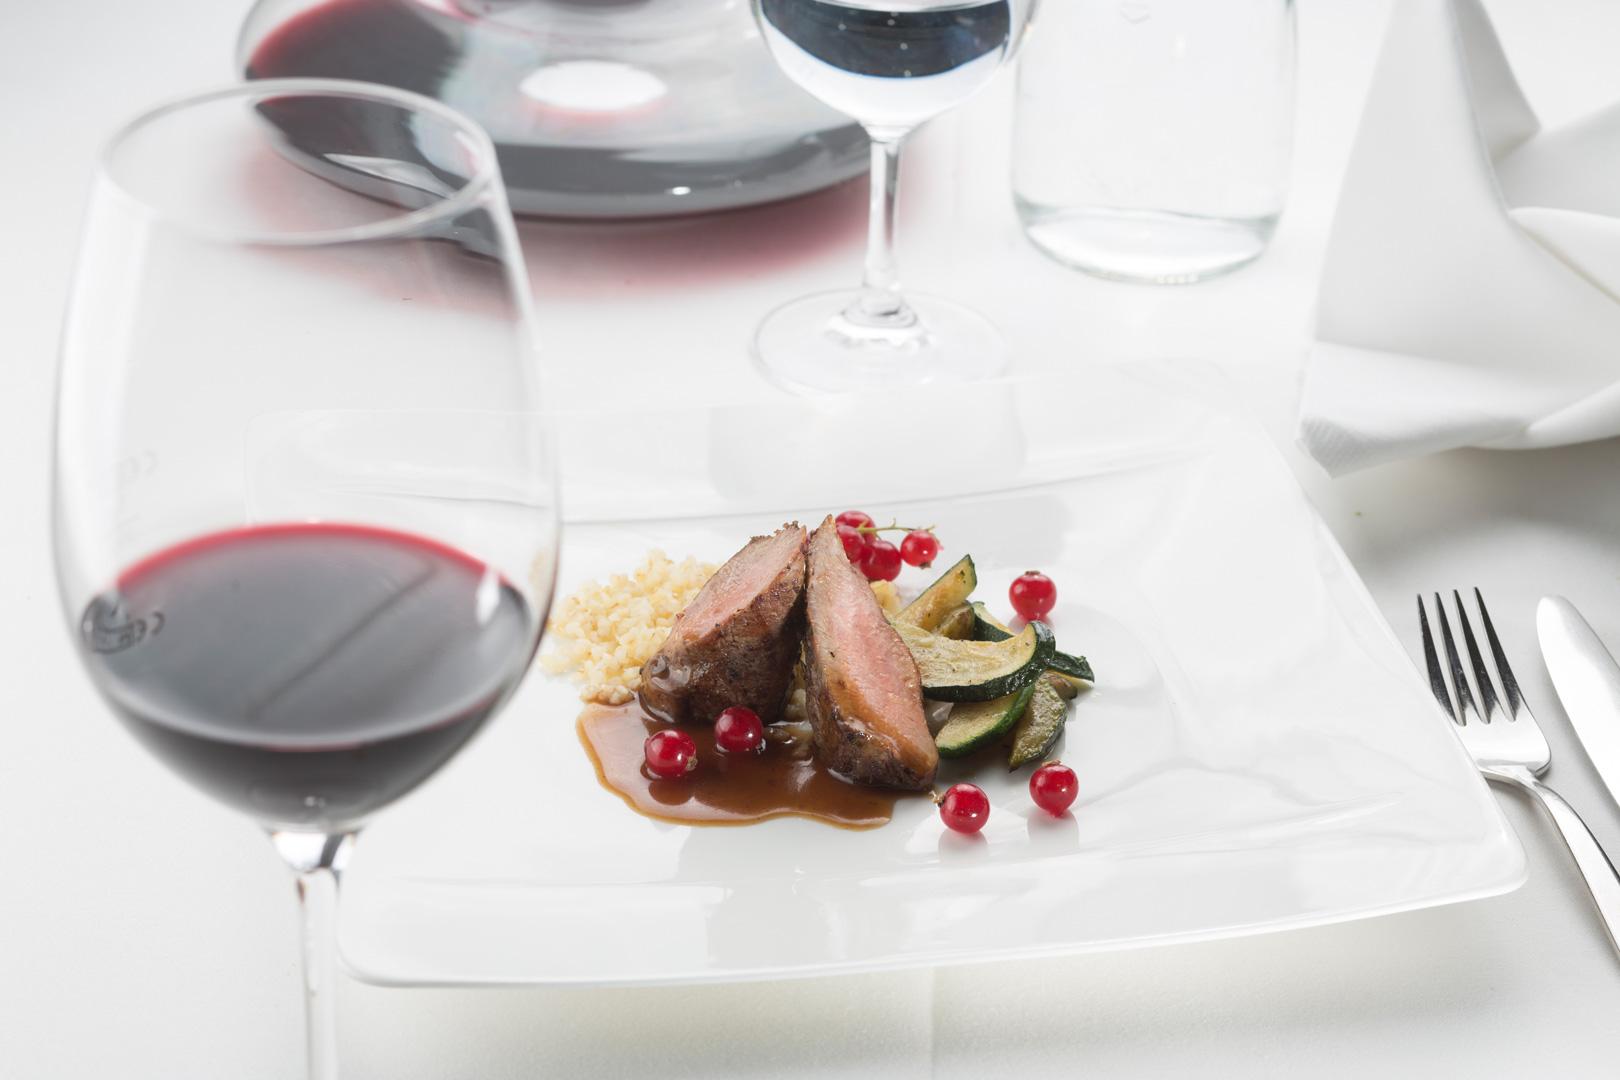 kulinarik-gourmet-wein-festival-larimar_hotel_larimar_bernhard_bergmann_9.jpg